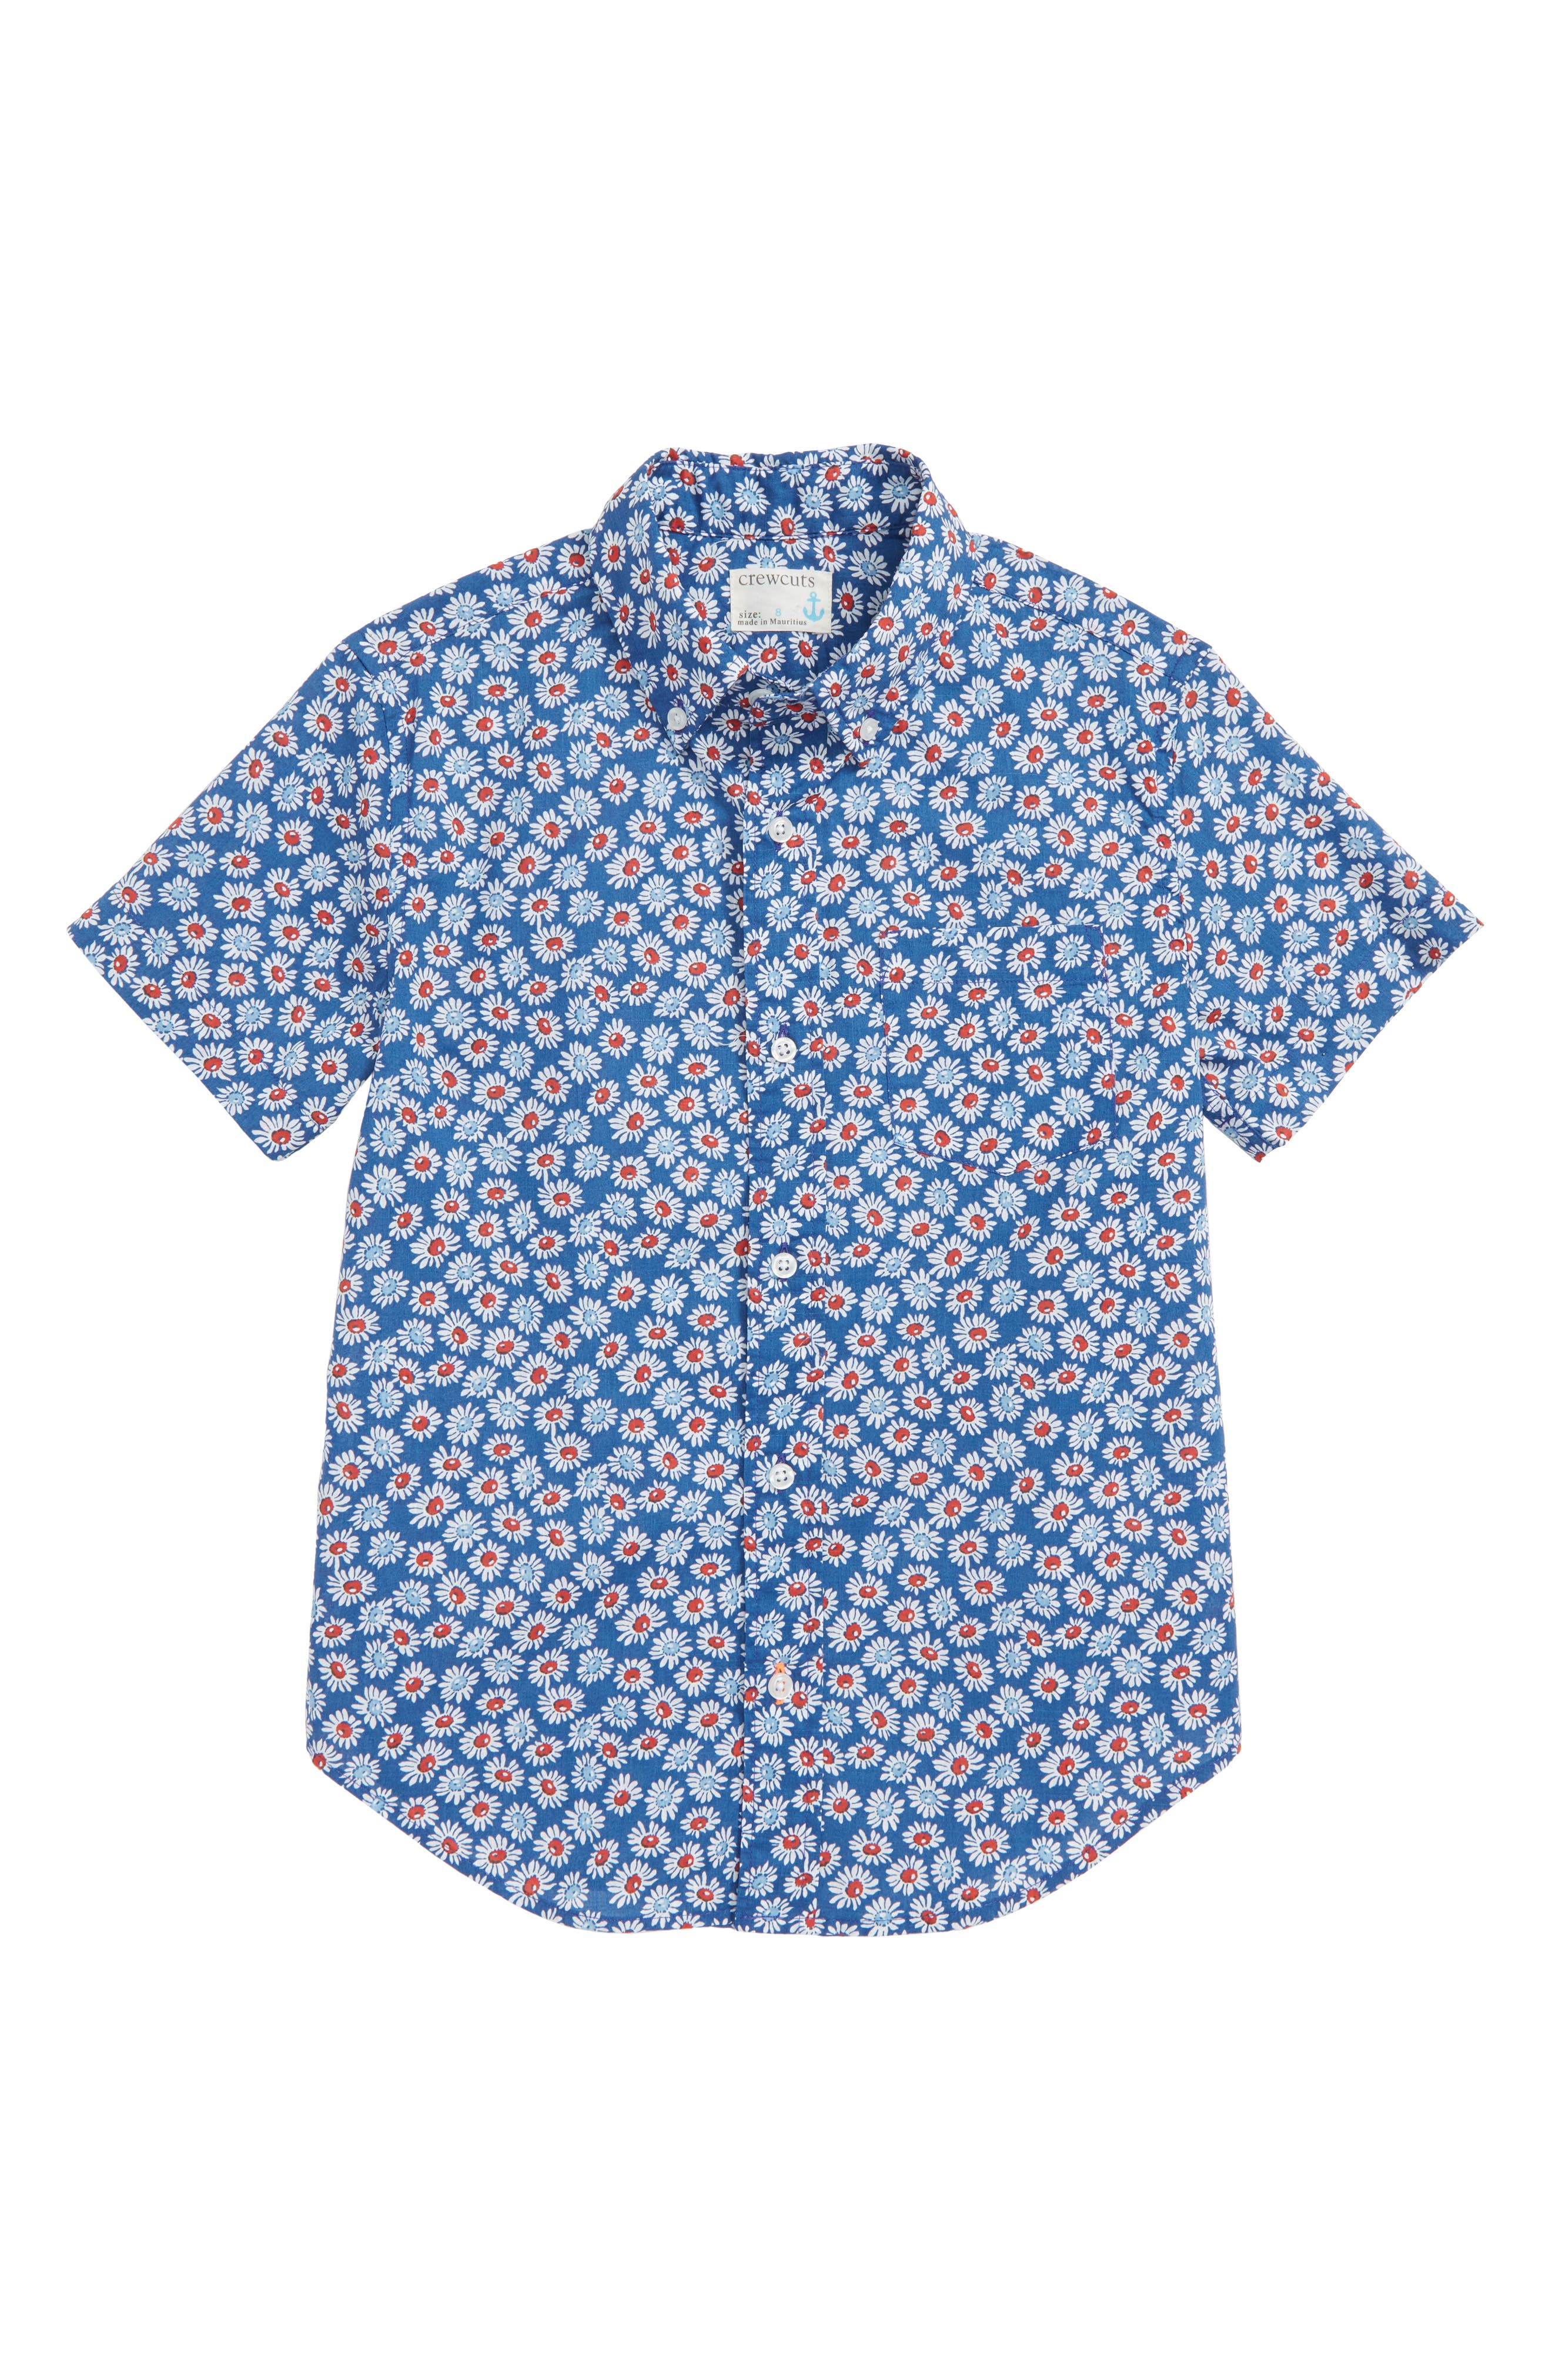 Secret Wash Daisy Shirt,                         Main,                         color, 400